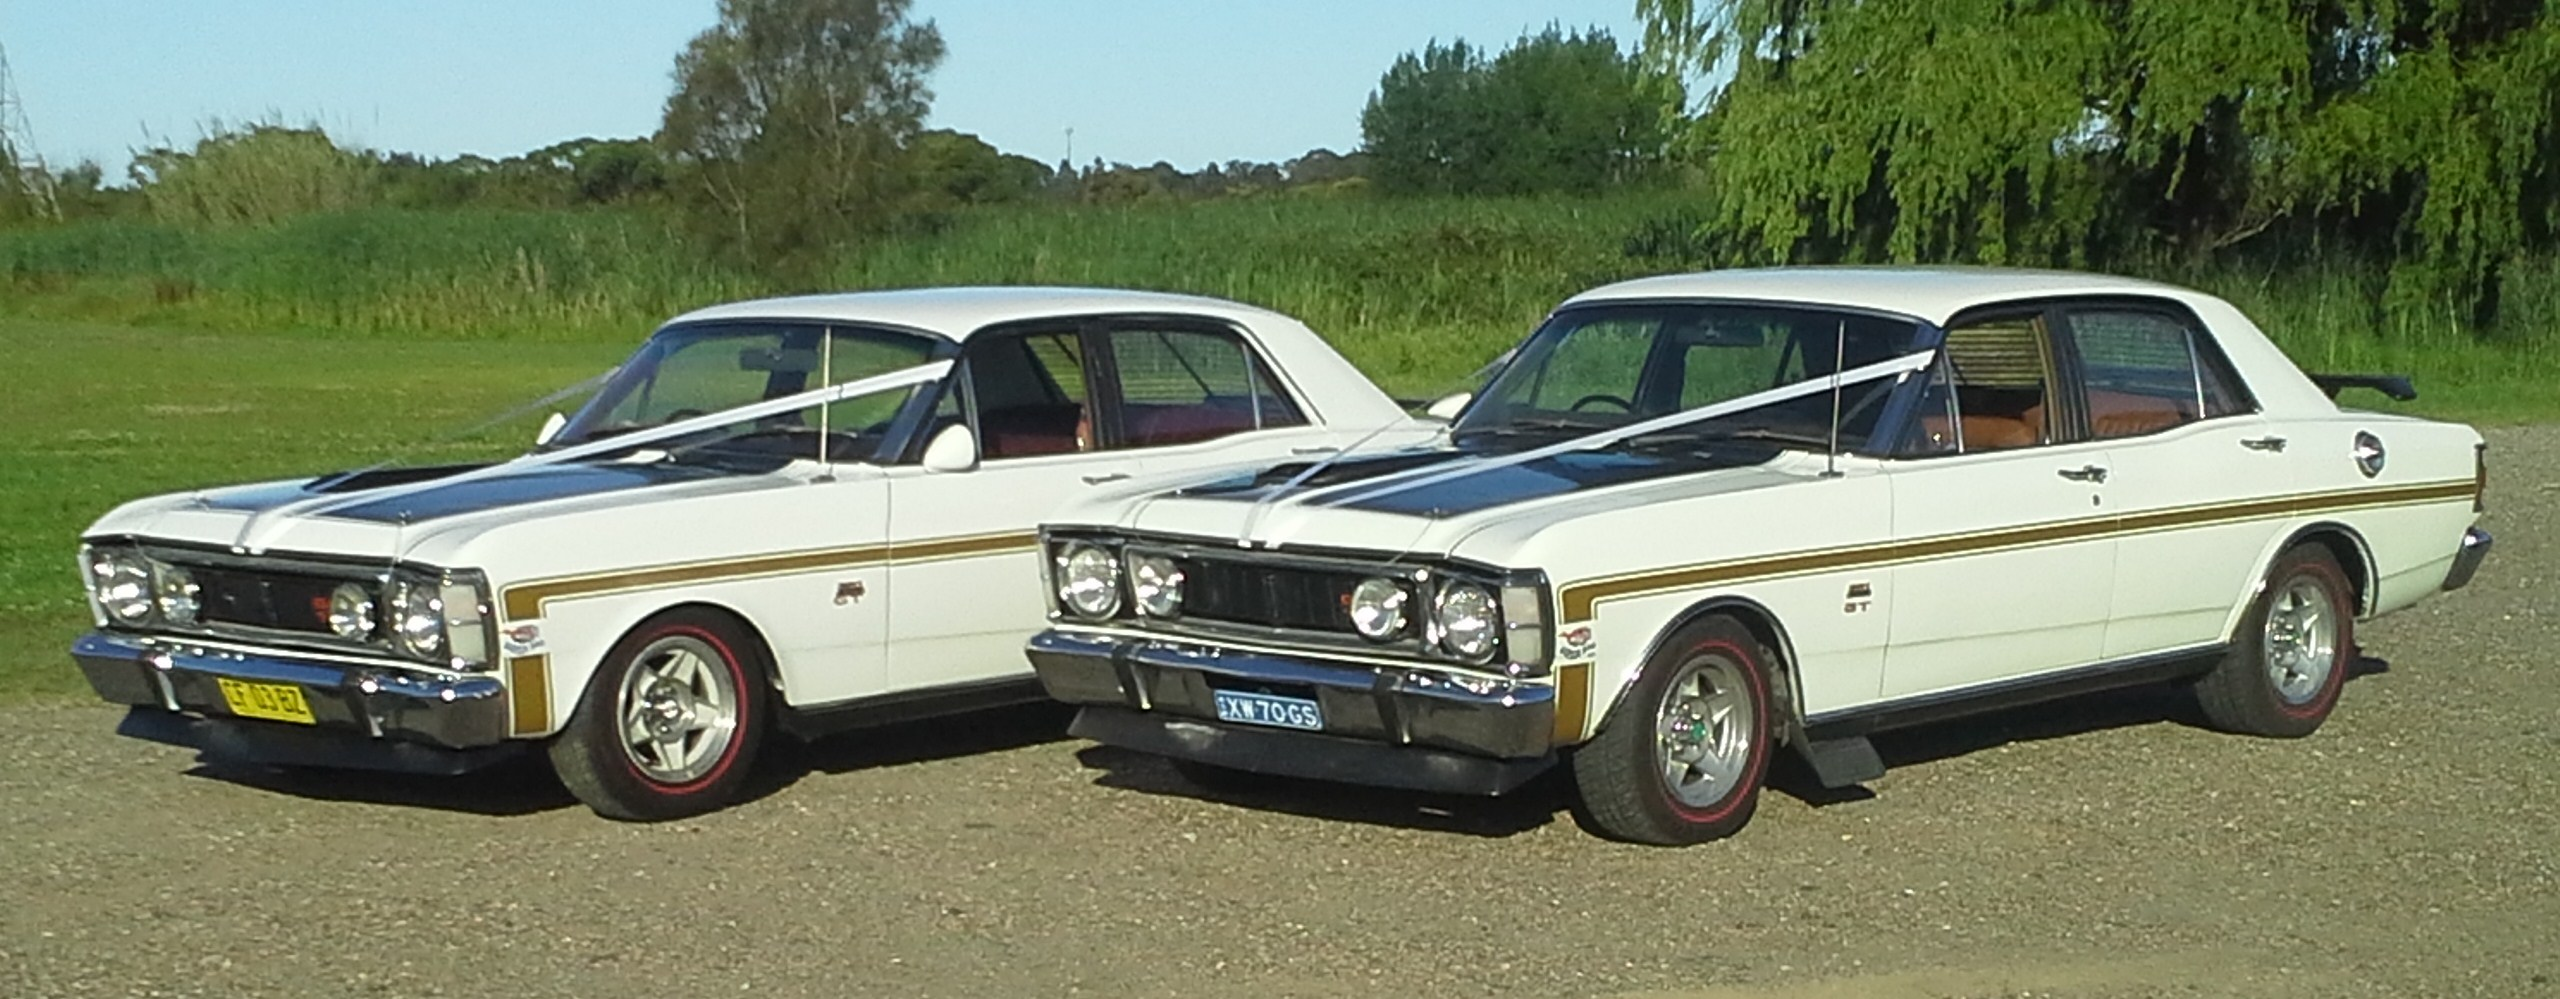 Classic Cars 4 U - Wallsend, NSW 2287 - 0438 537 875 | ShowMeLocal.com